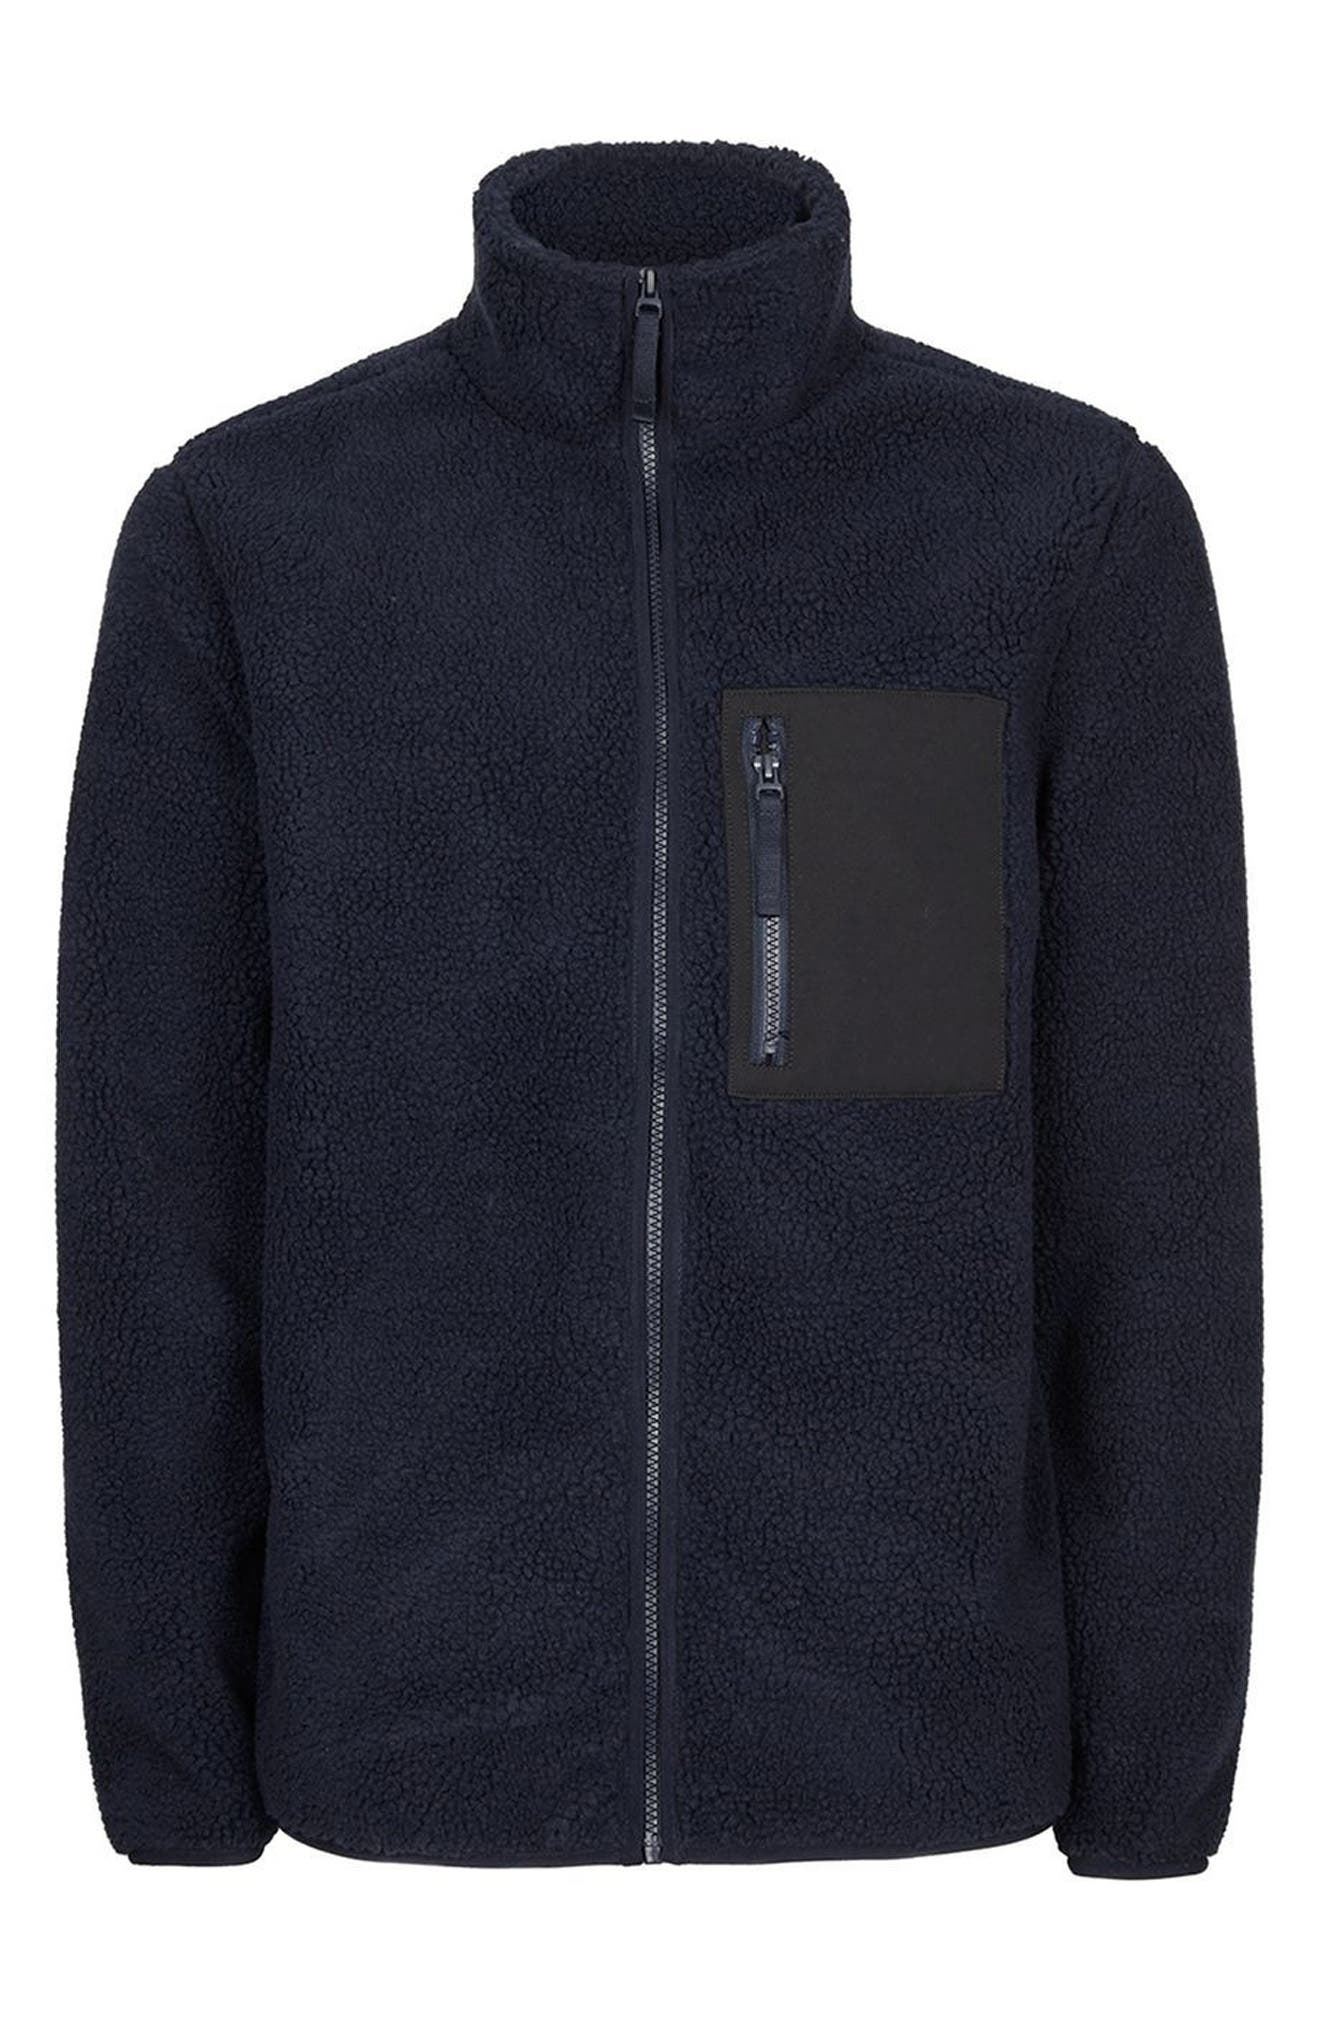 Textured Borg Fleece Jacket,                             Alternate thumbnail 3, color,                             401